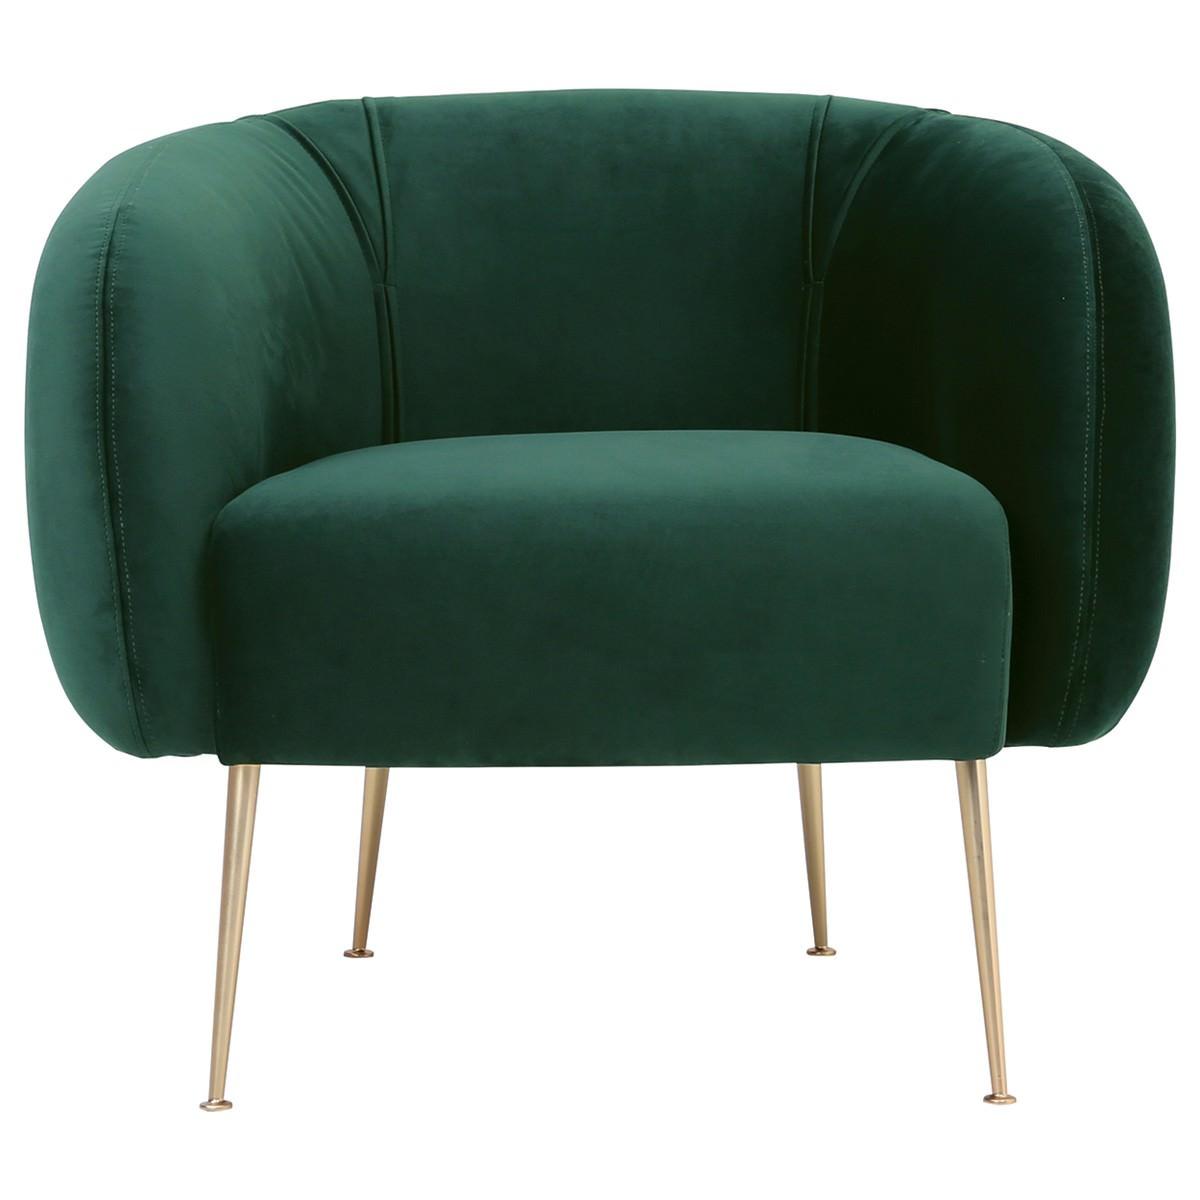 Alero VCommercial Grade eloutine Fabric Armchair, Dark Green